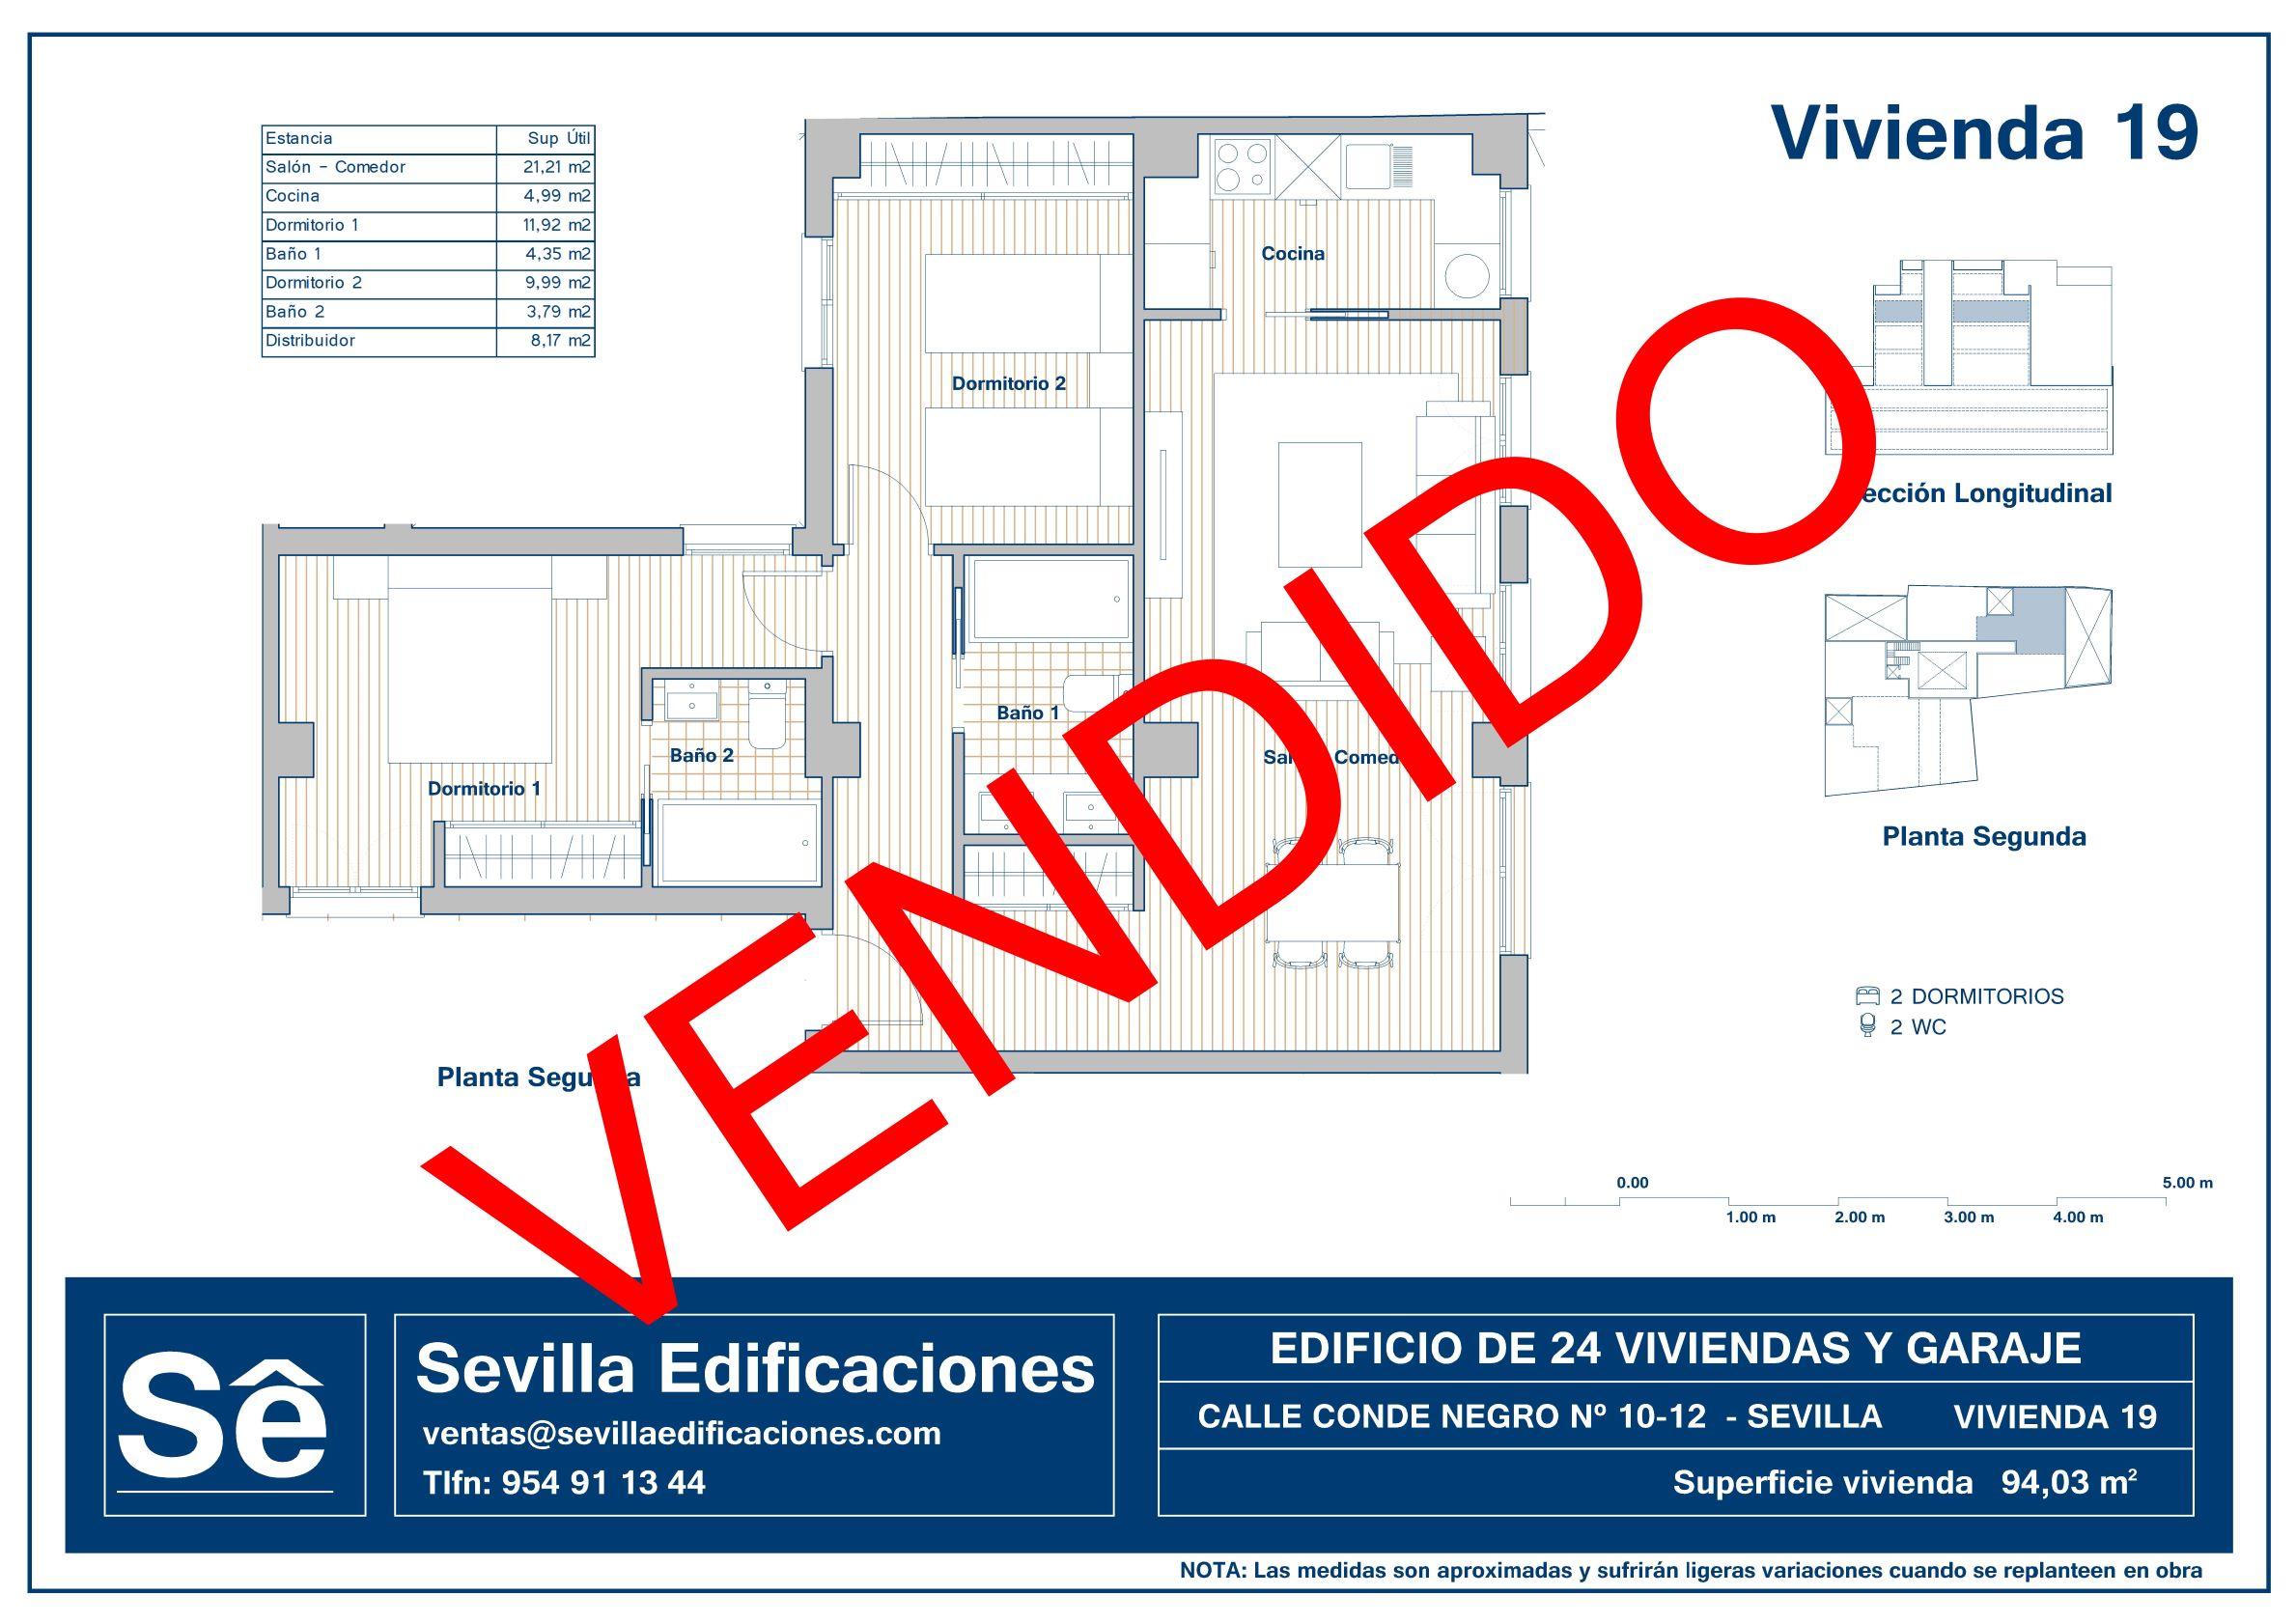 CONDENEGRO_VIVIENDA_19_VENDIDO